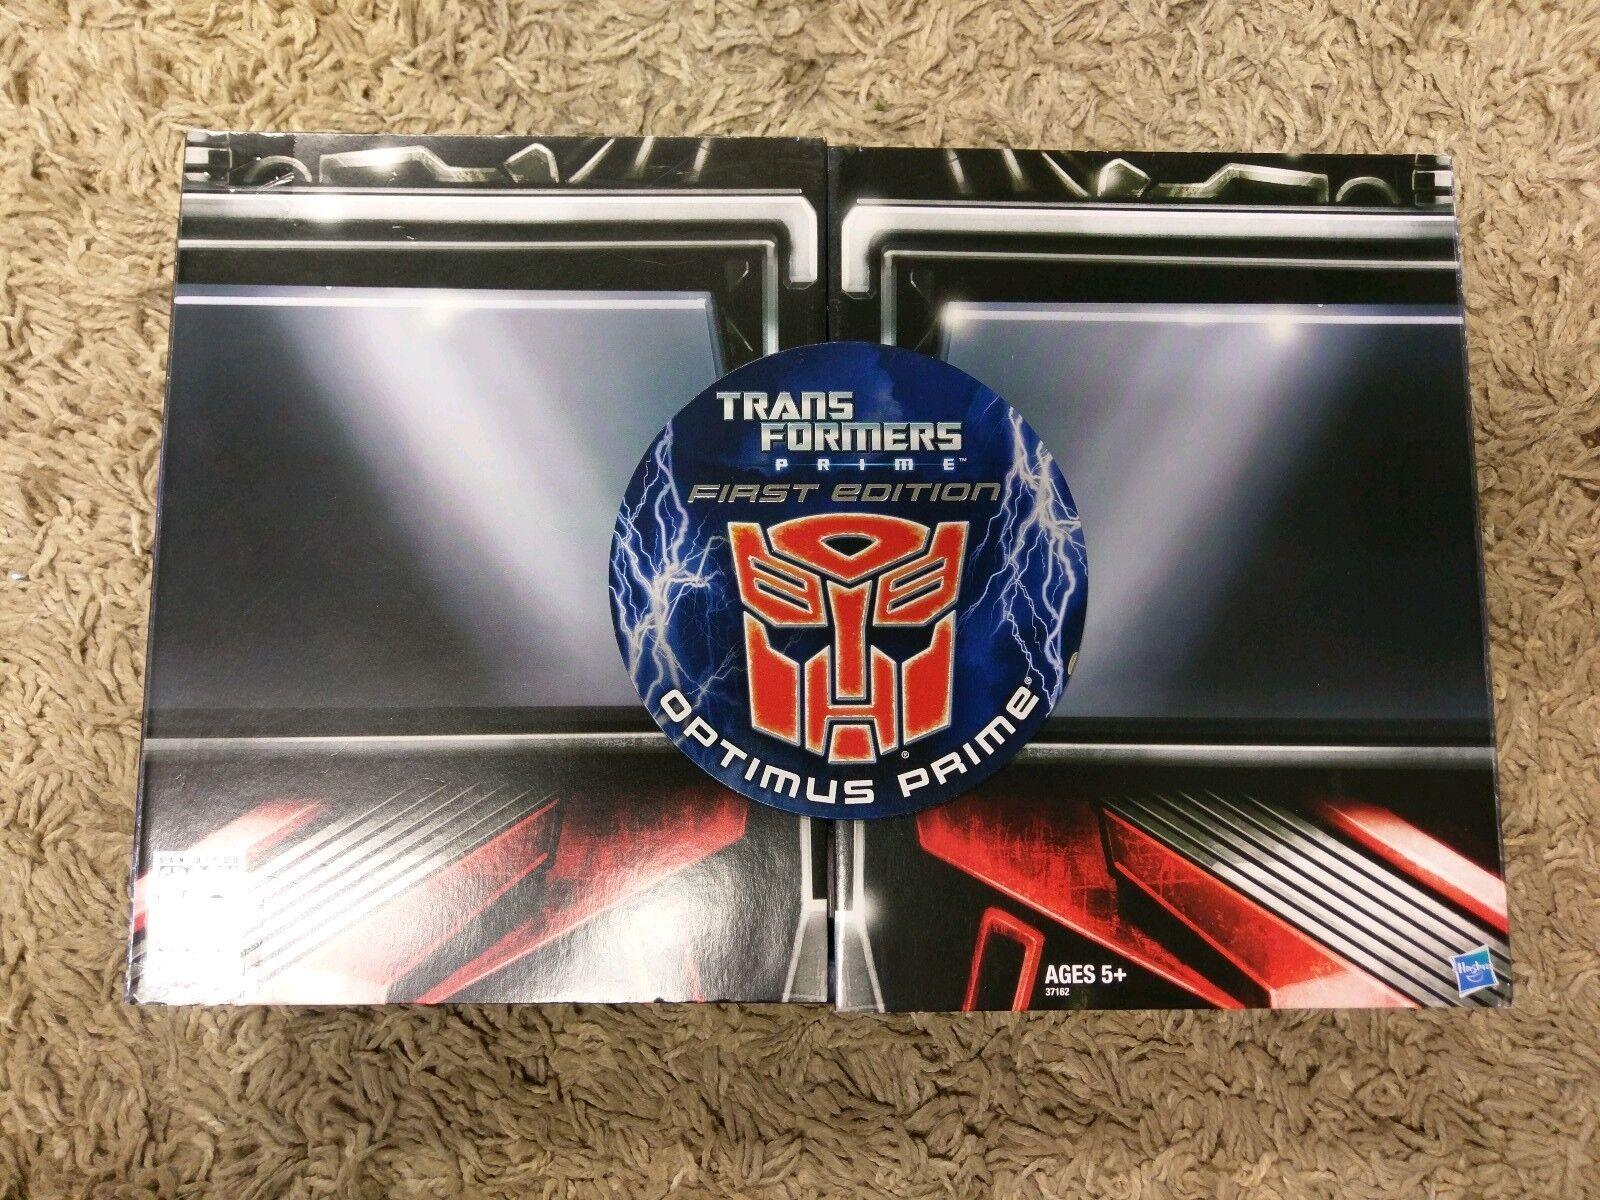 Transformers Optimus Prime SDCC w box Deluxe Prime